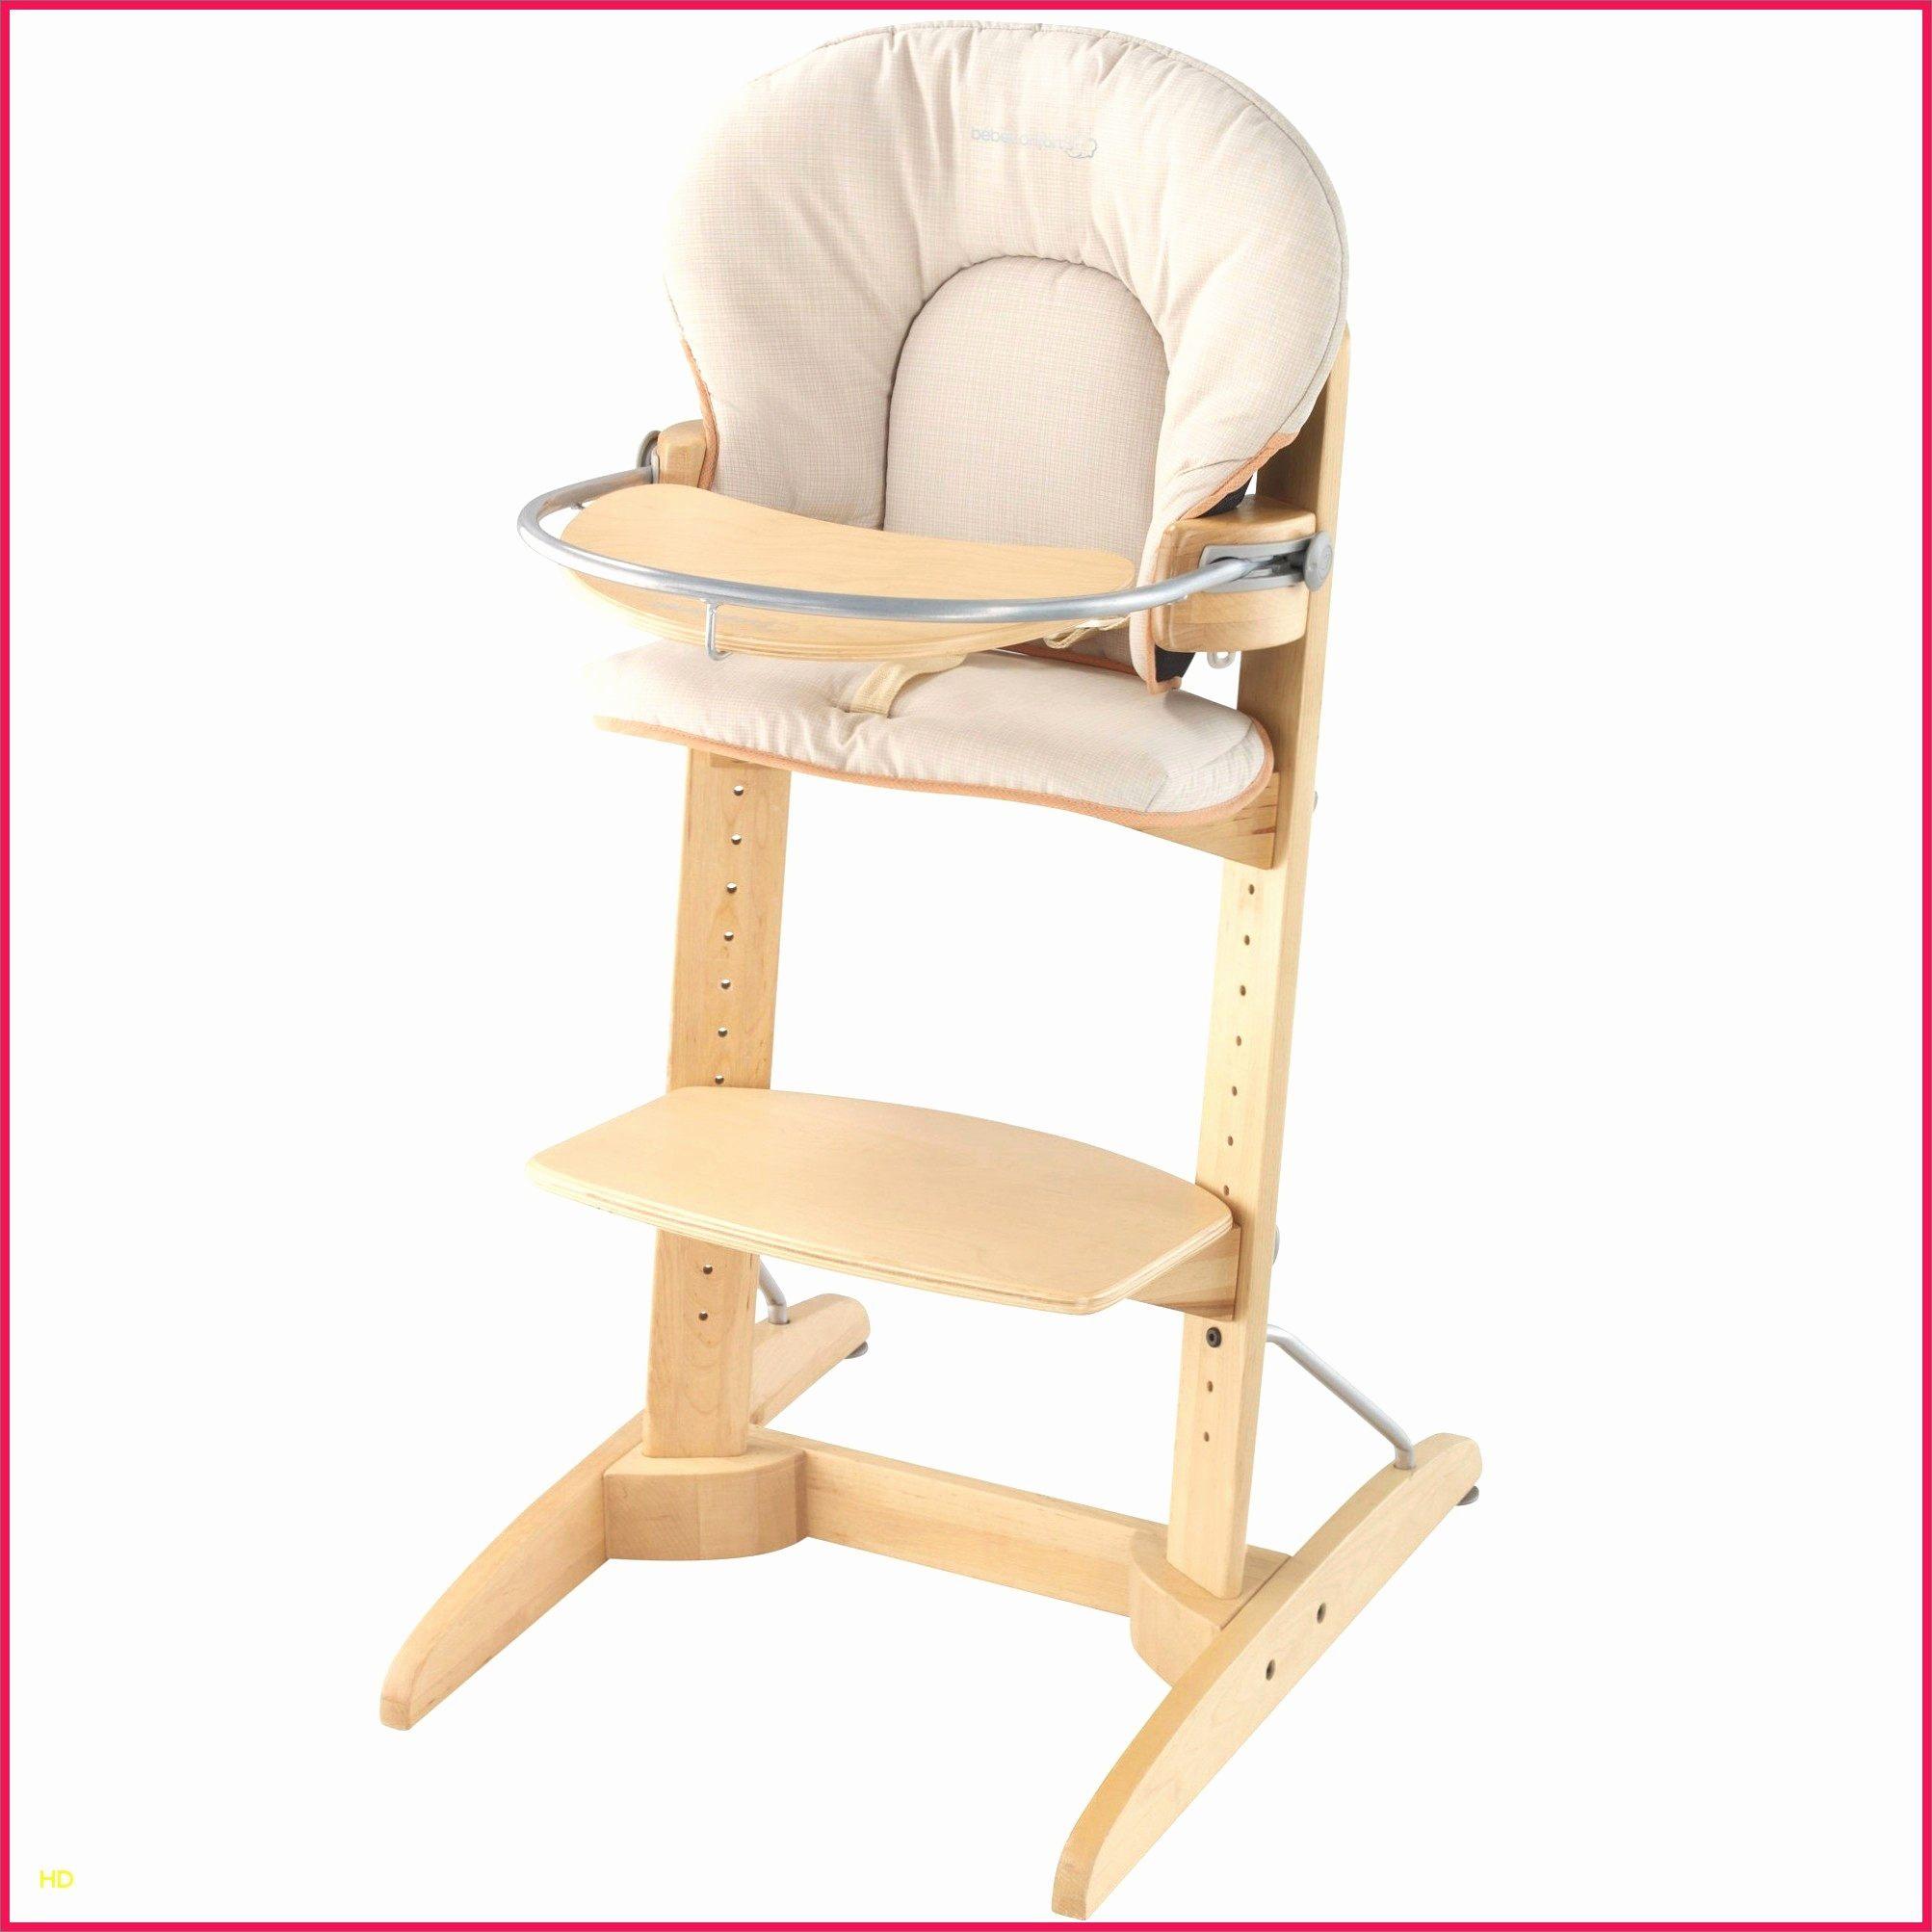 Chicco Lit Bebe Charmant Chaise Haute Transat Bebe Nouveau Chaise Haute Transat Chicco